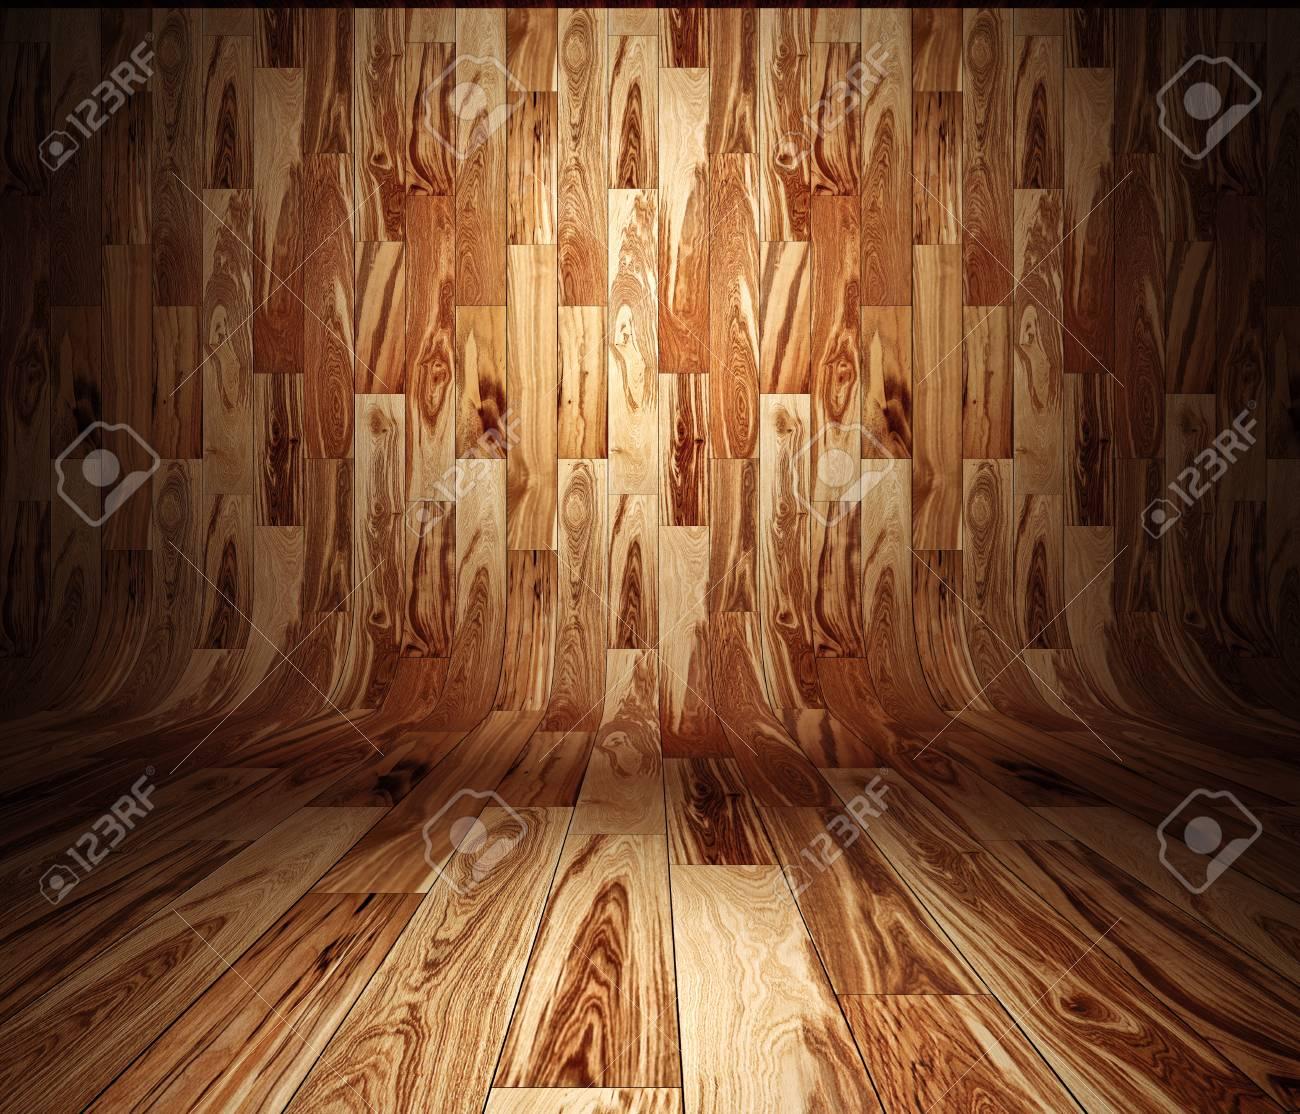 Wood panels used as background Stock Photo - 16790399